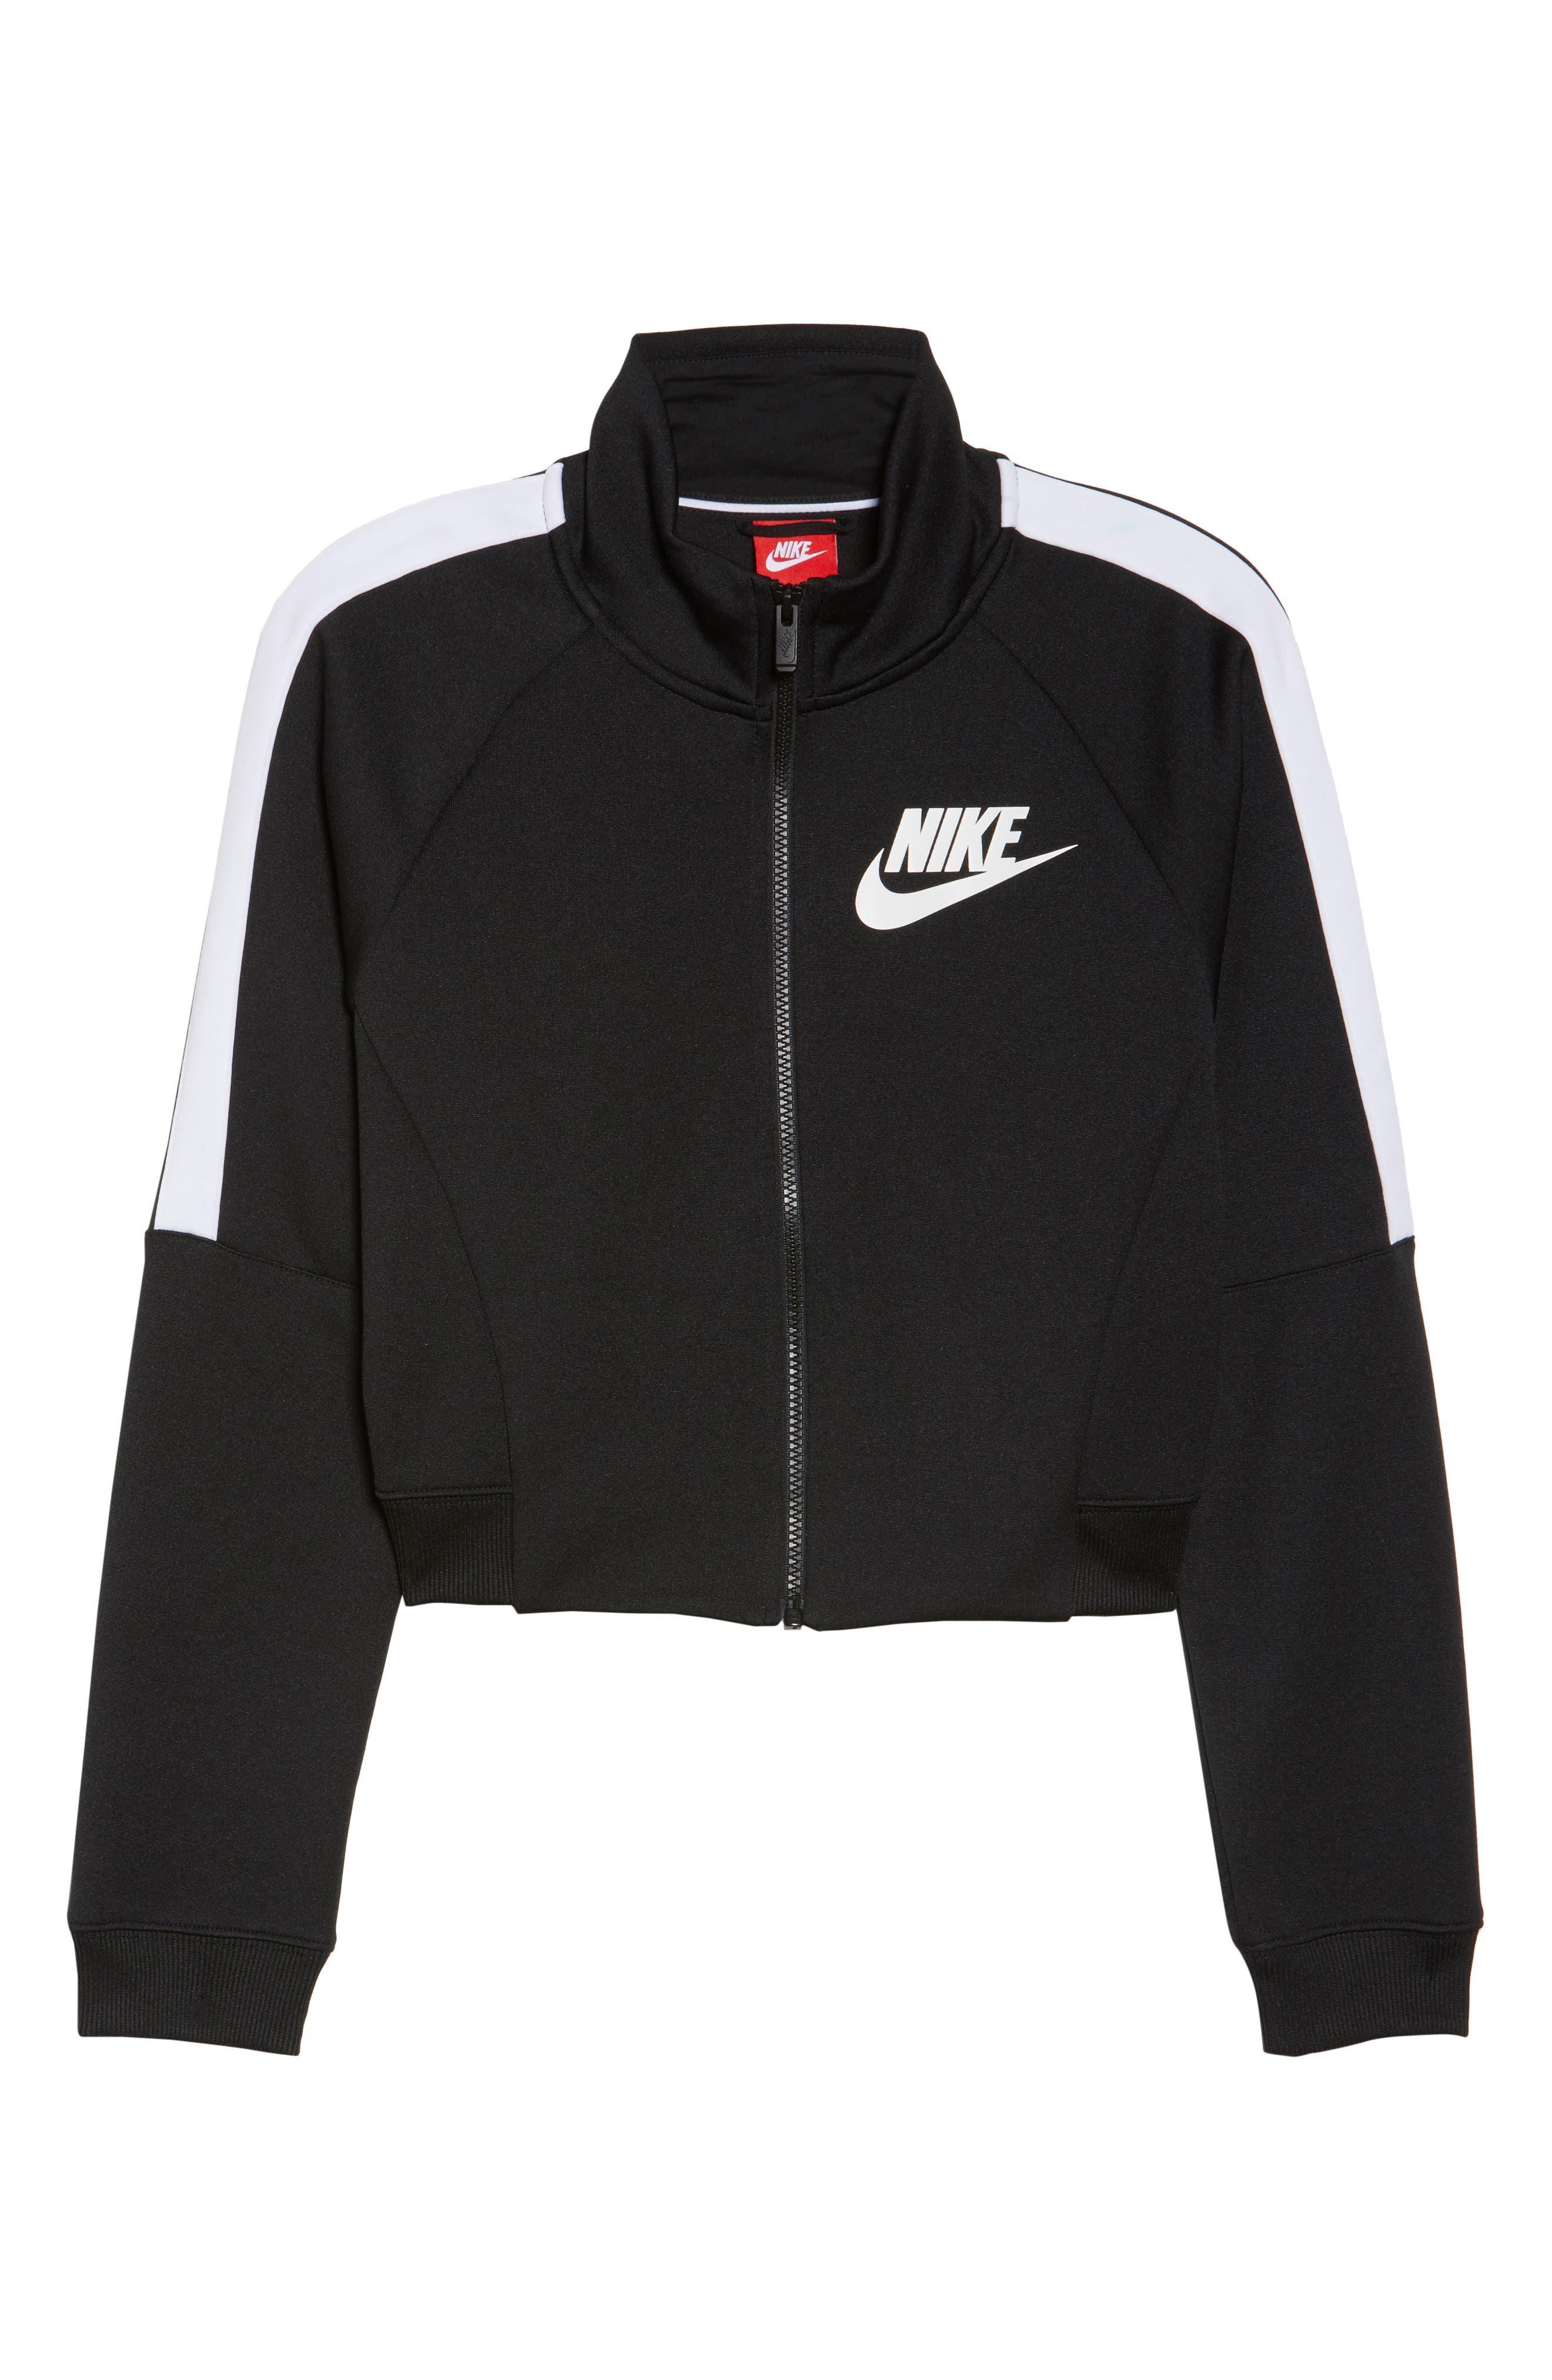 Sportswear N98 Jacket,                             Alternate thumbnail 7, color,                             Black/ White